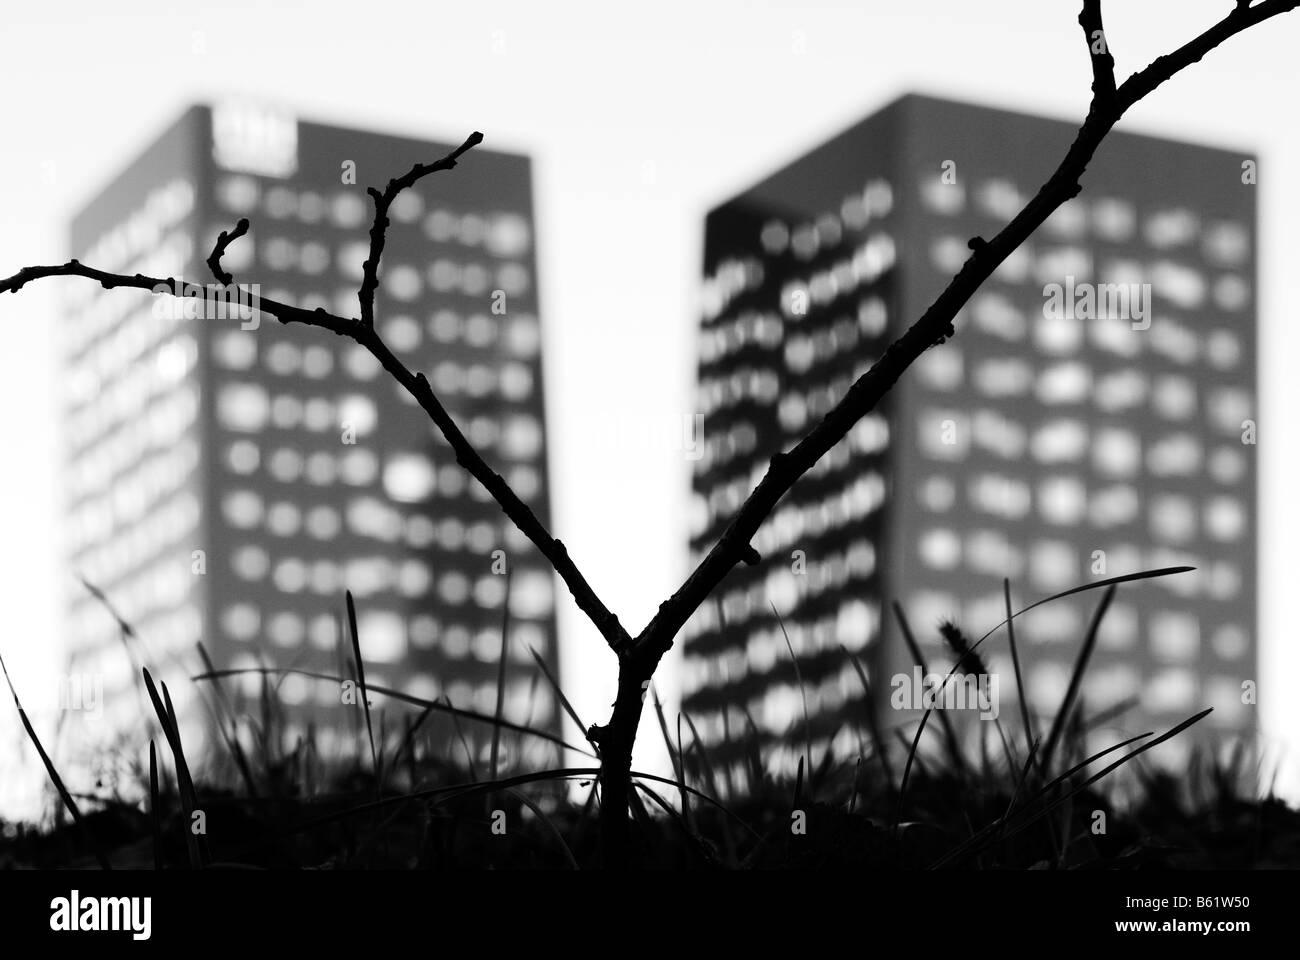 Milan. Twin skyscrapers - Stock Image